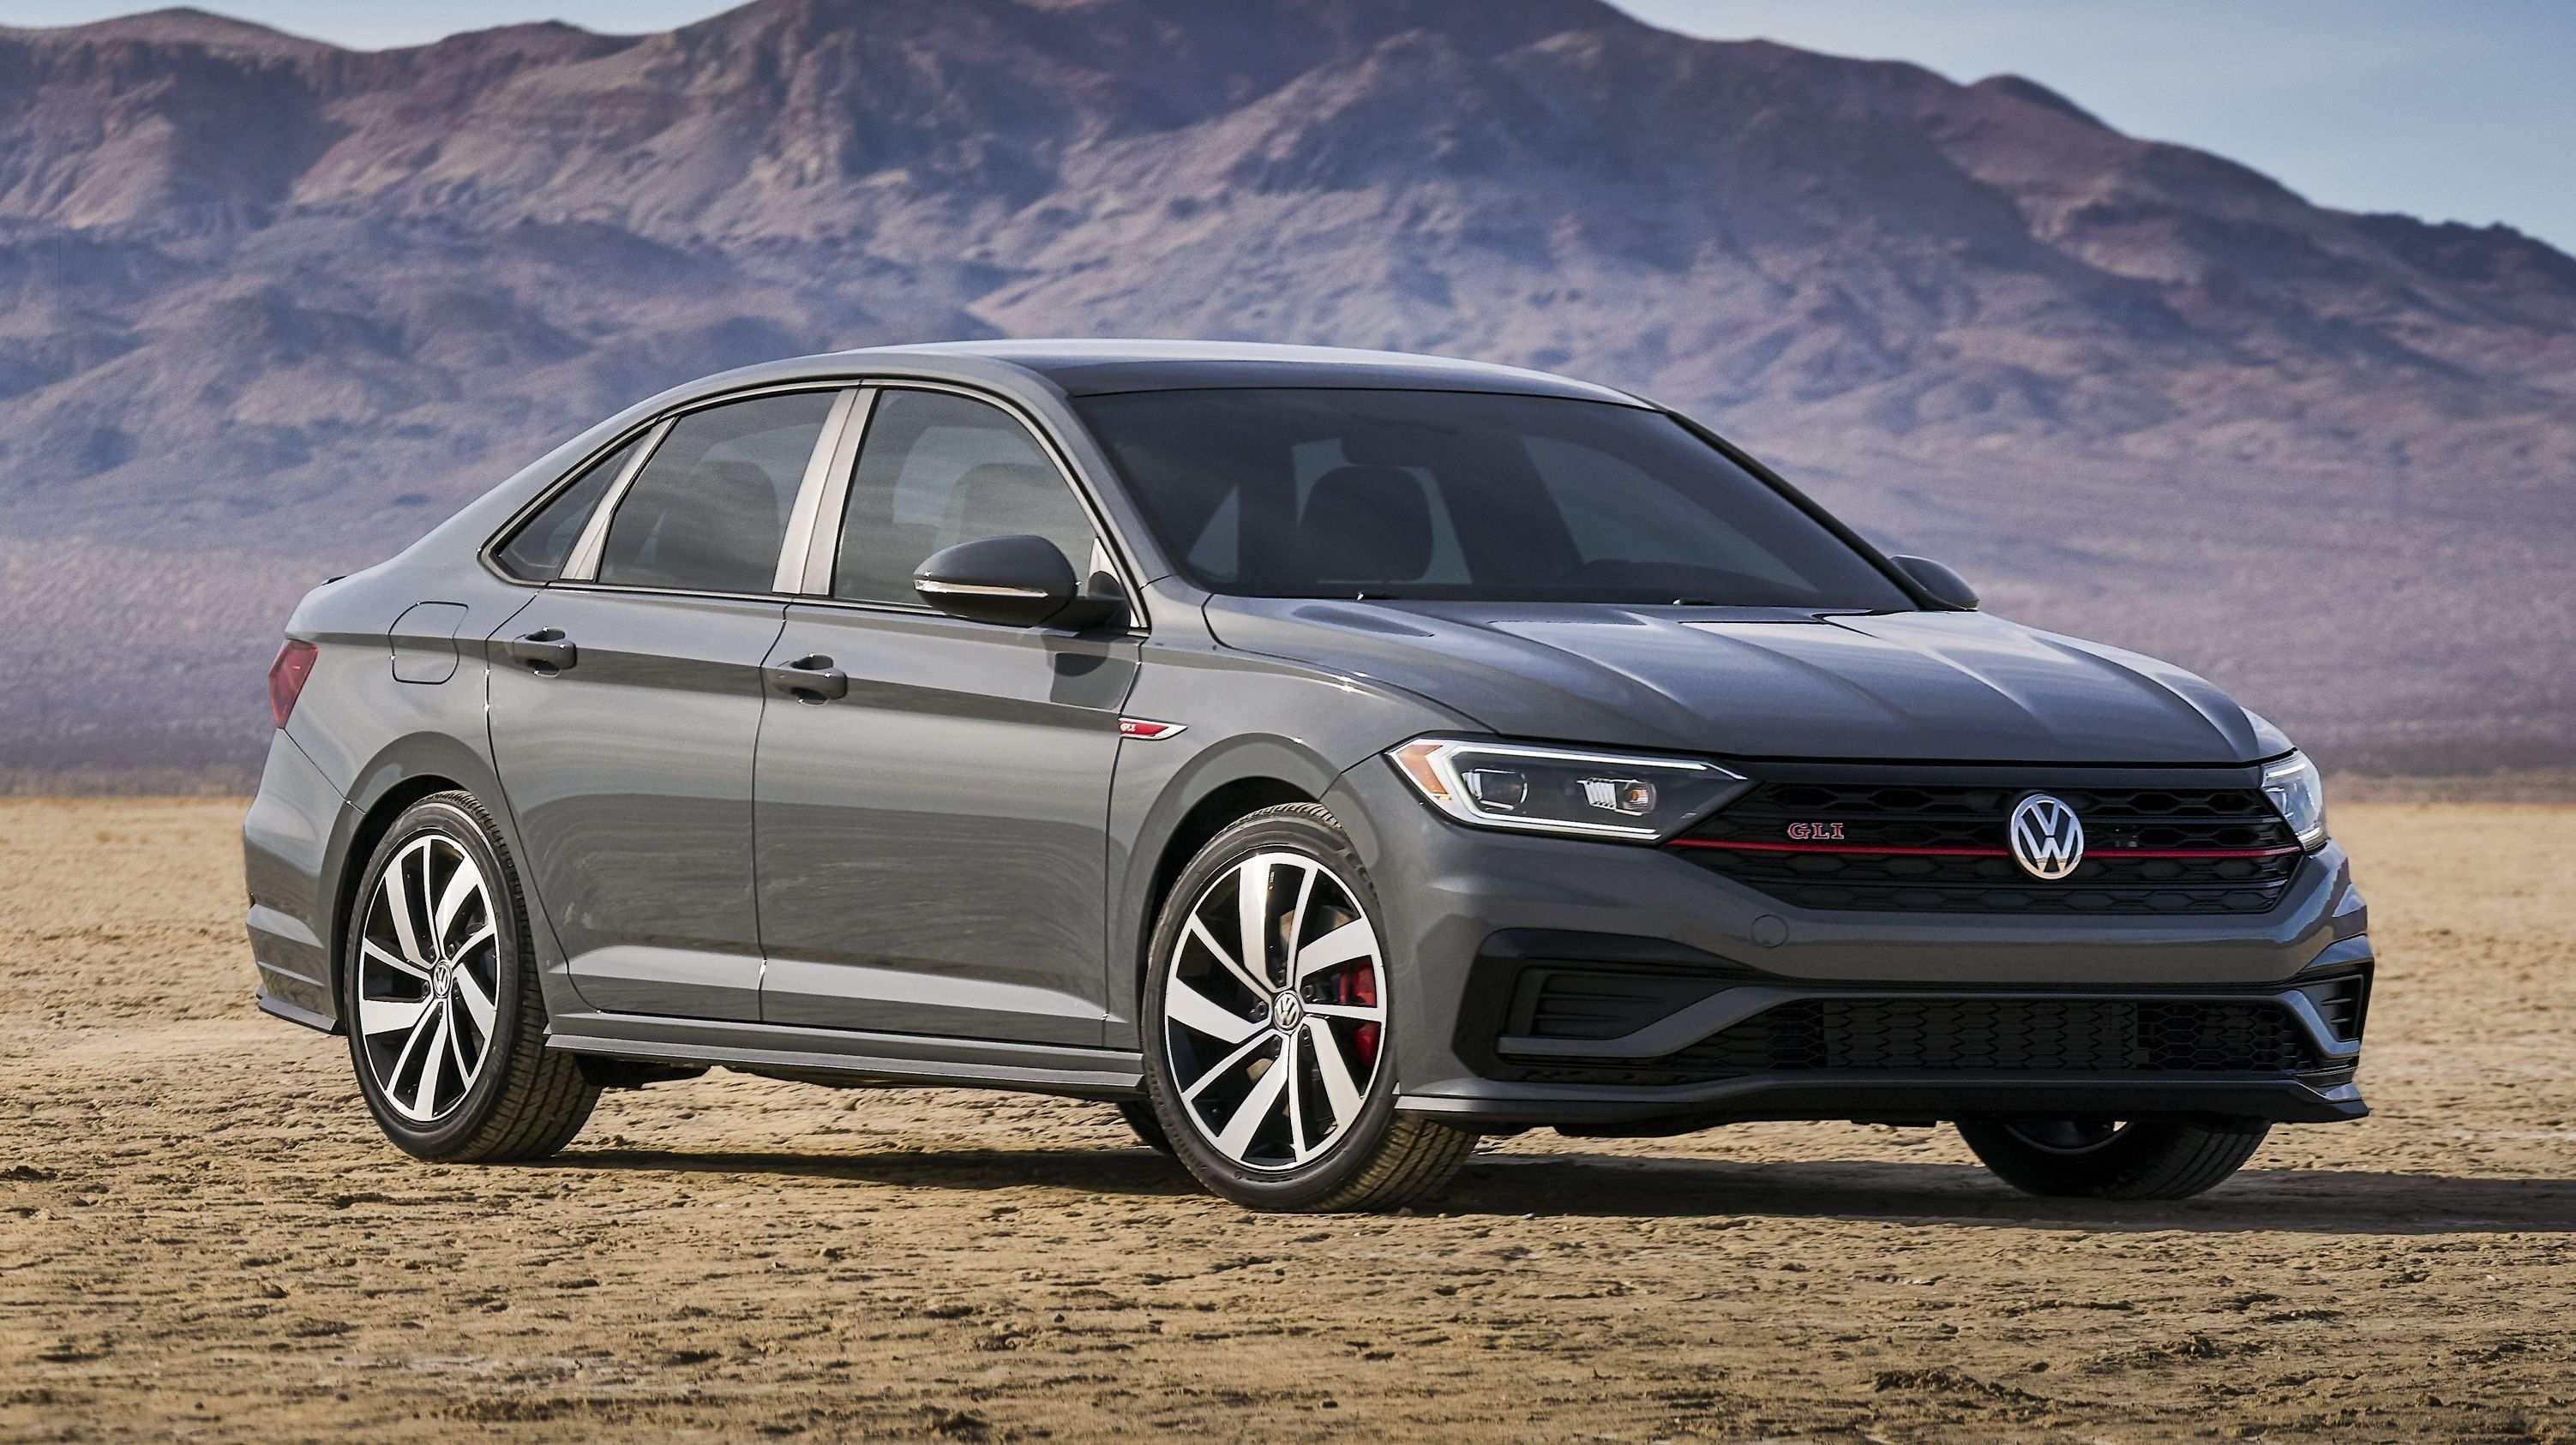 25 Concept of Volkswagen Gli 2020 Spy Shoot for Volkswagen Gli 2020